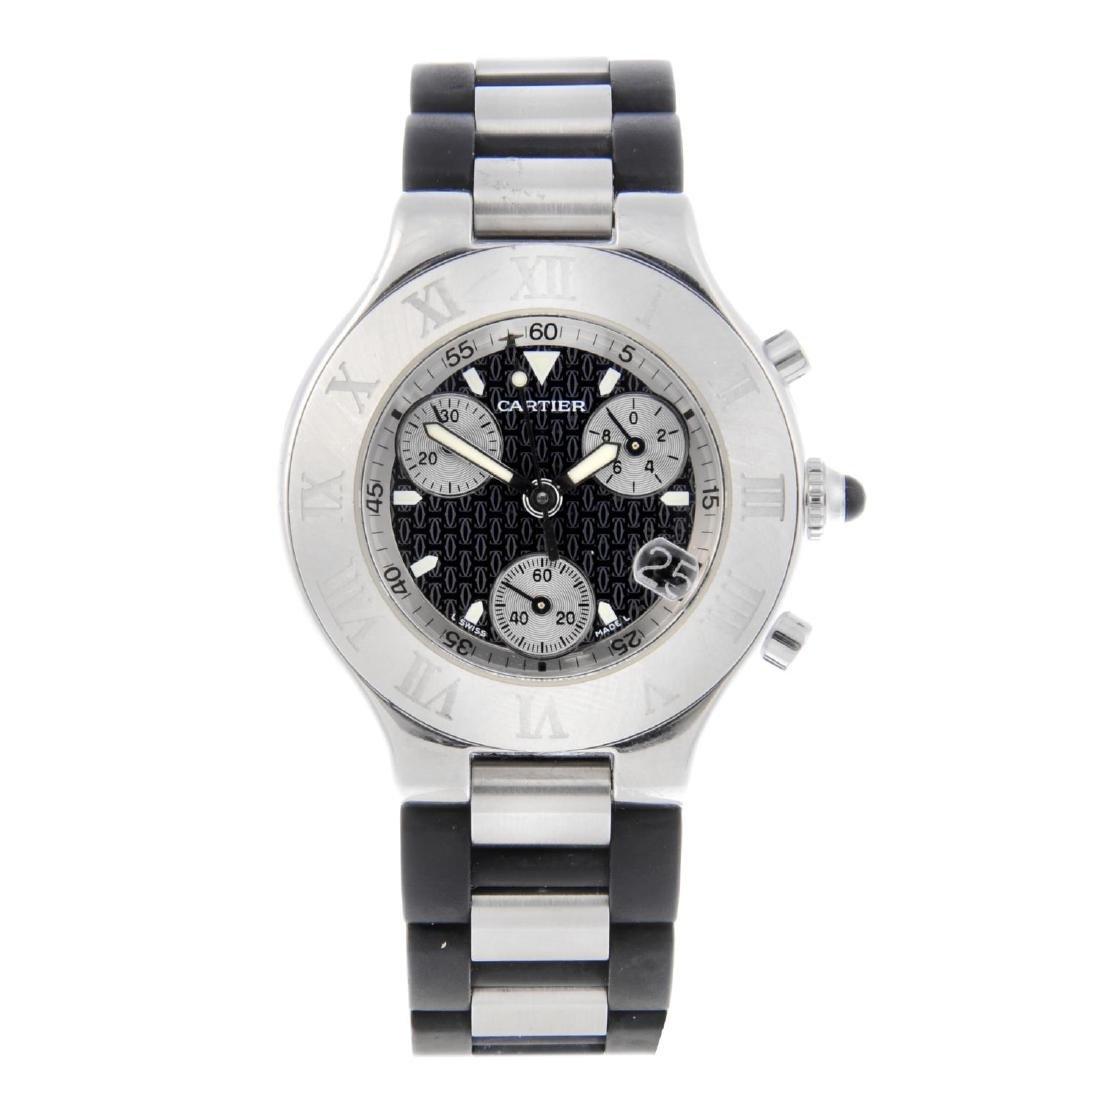 CARTIER - a Chronoscaph 21 chronograph wrist watch.